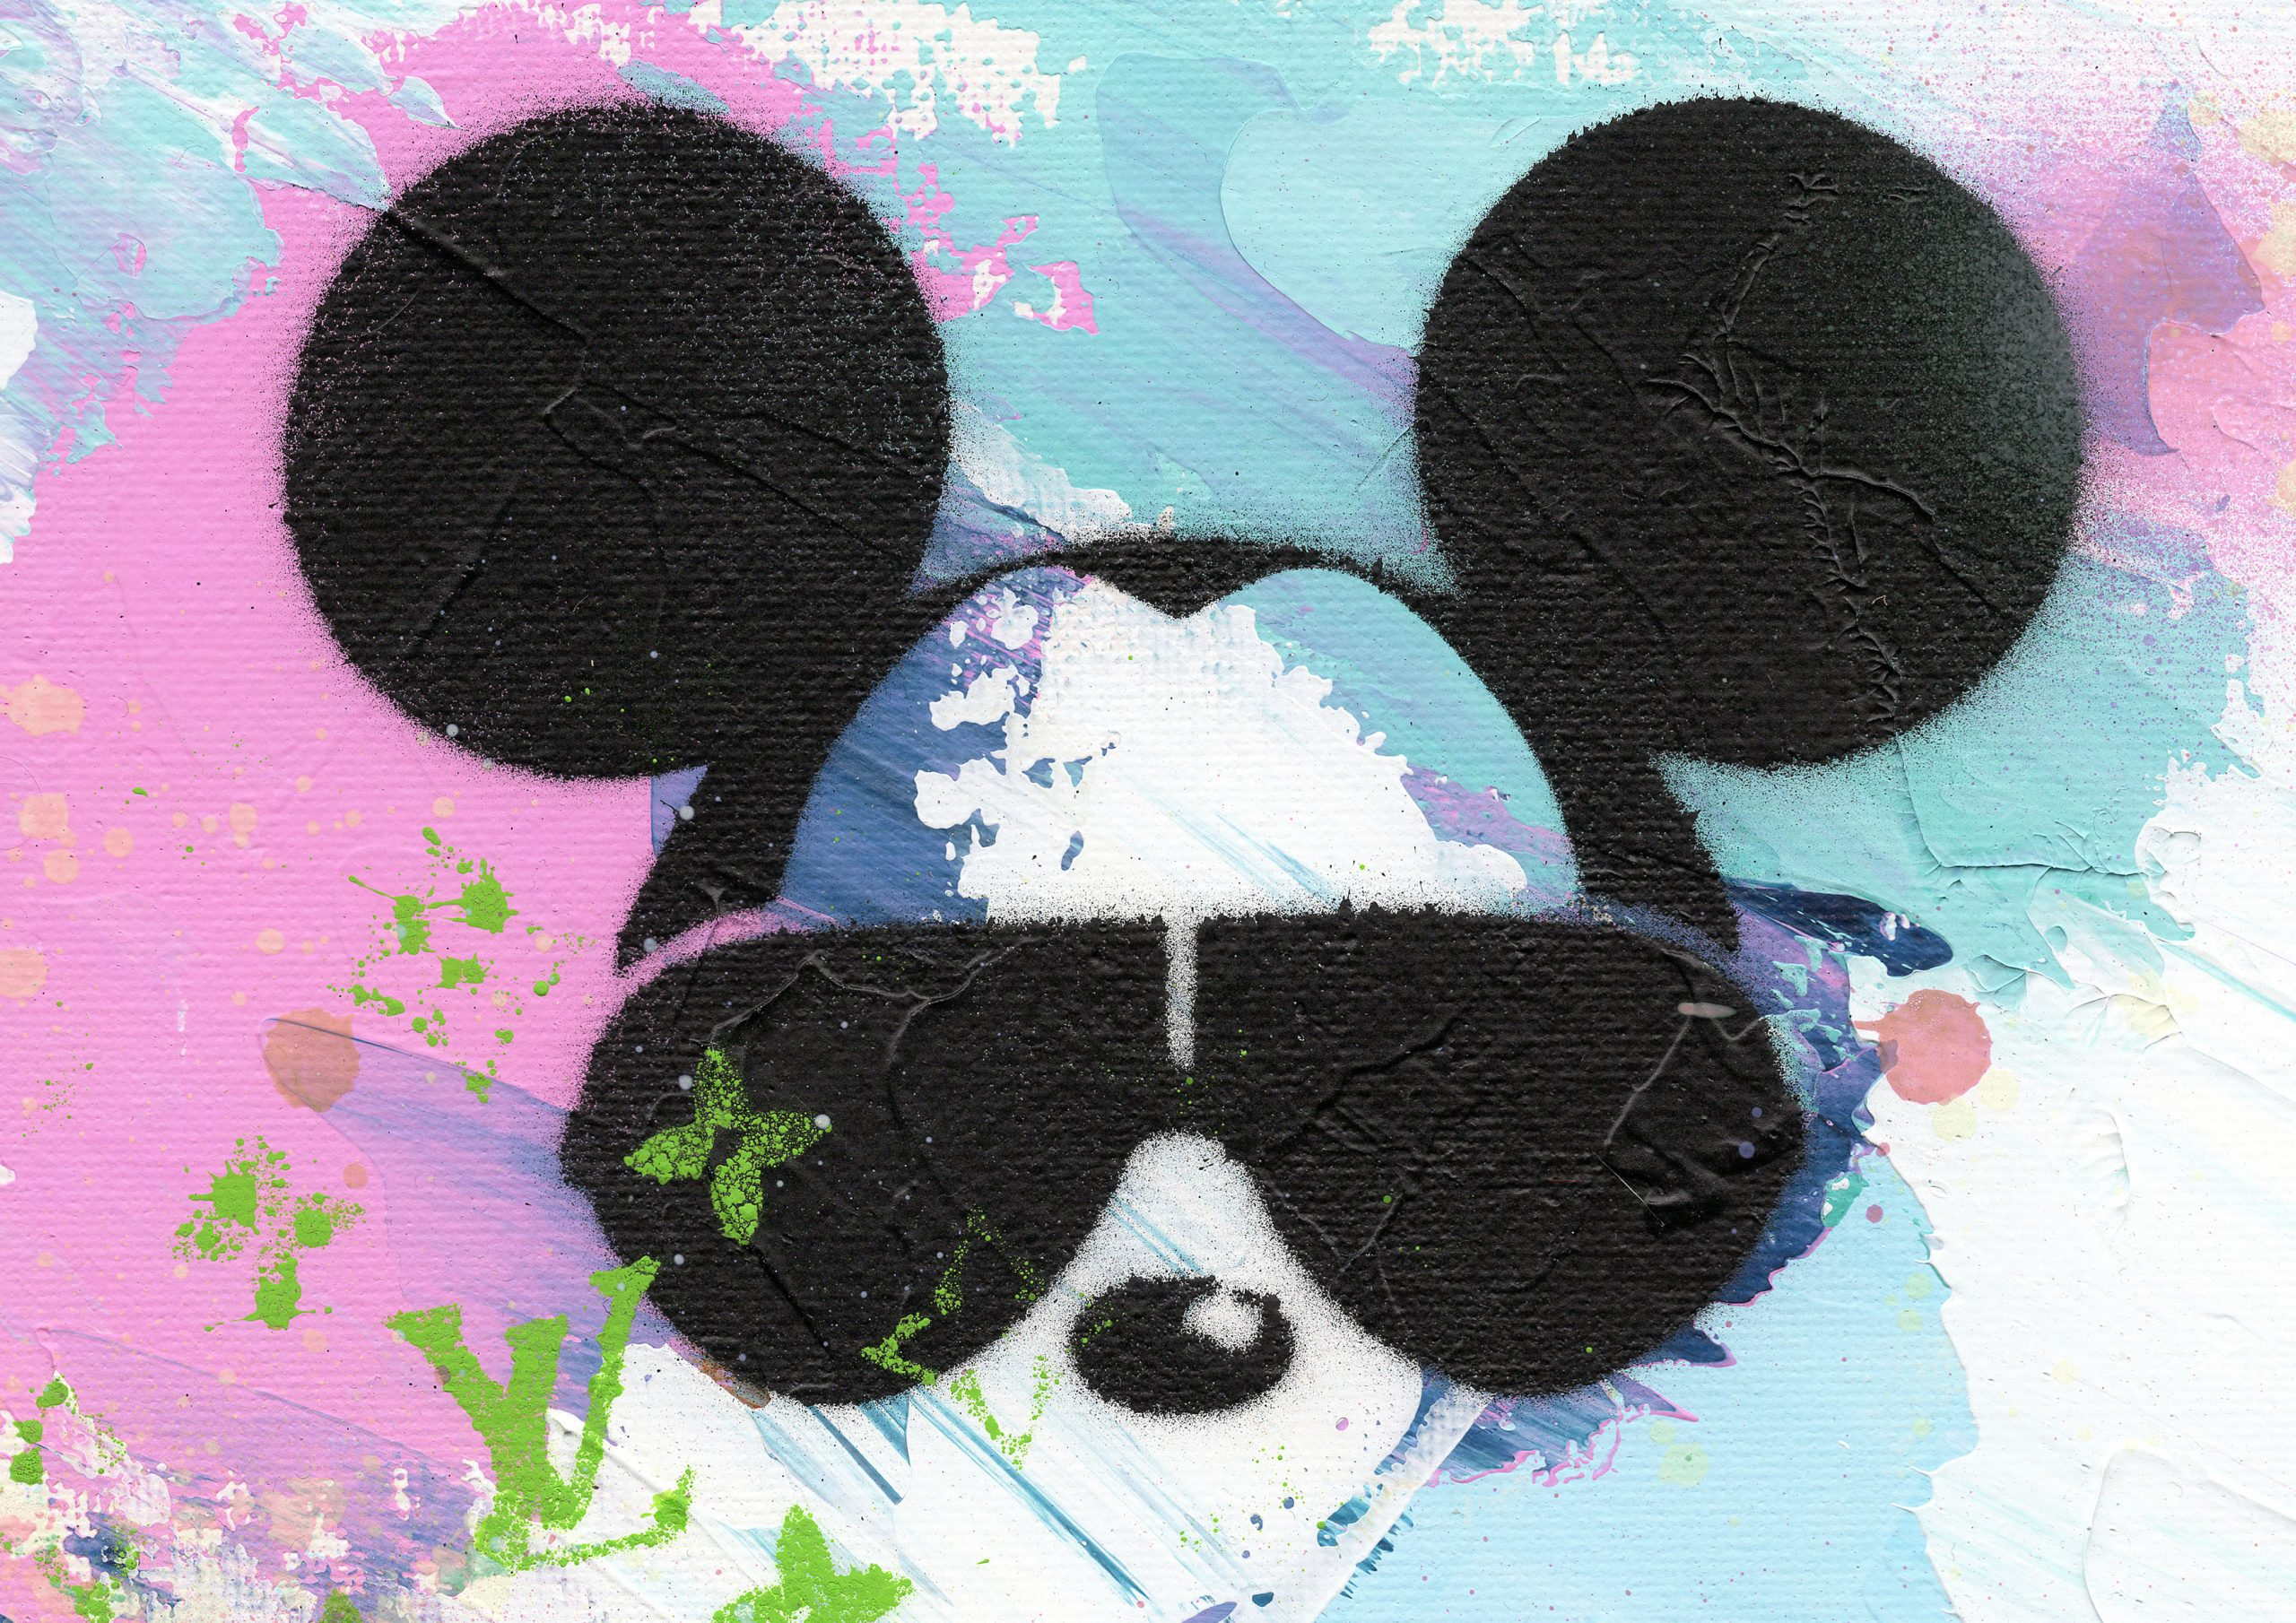 NATALIE-OTALORA-ART-GRAFFITI-MICKEY WANTS TO BE YOUR FRIEND-DETAIL1